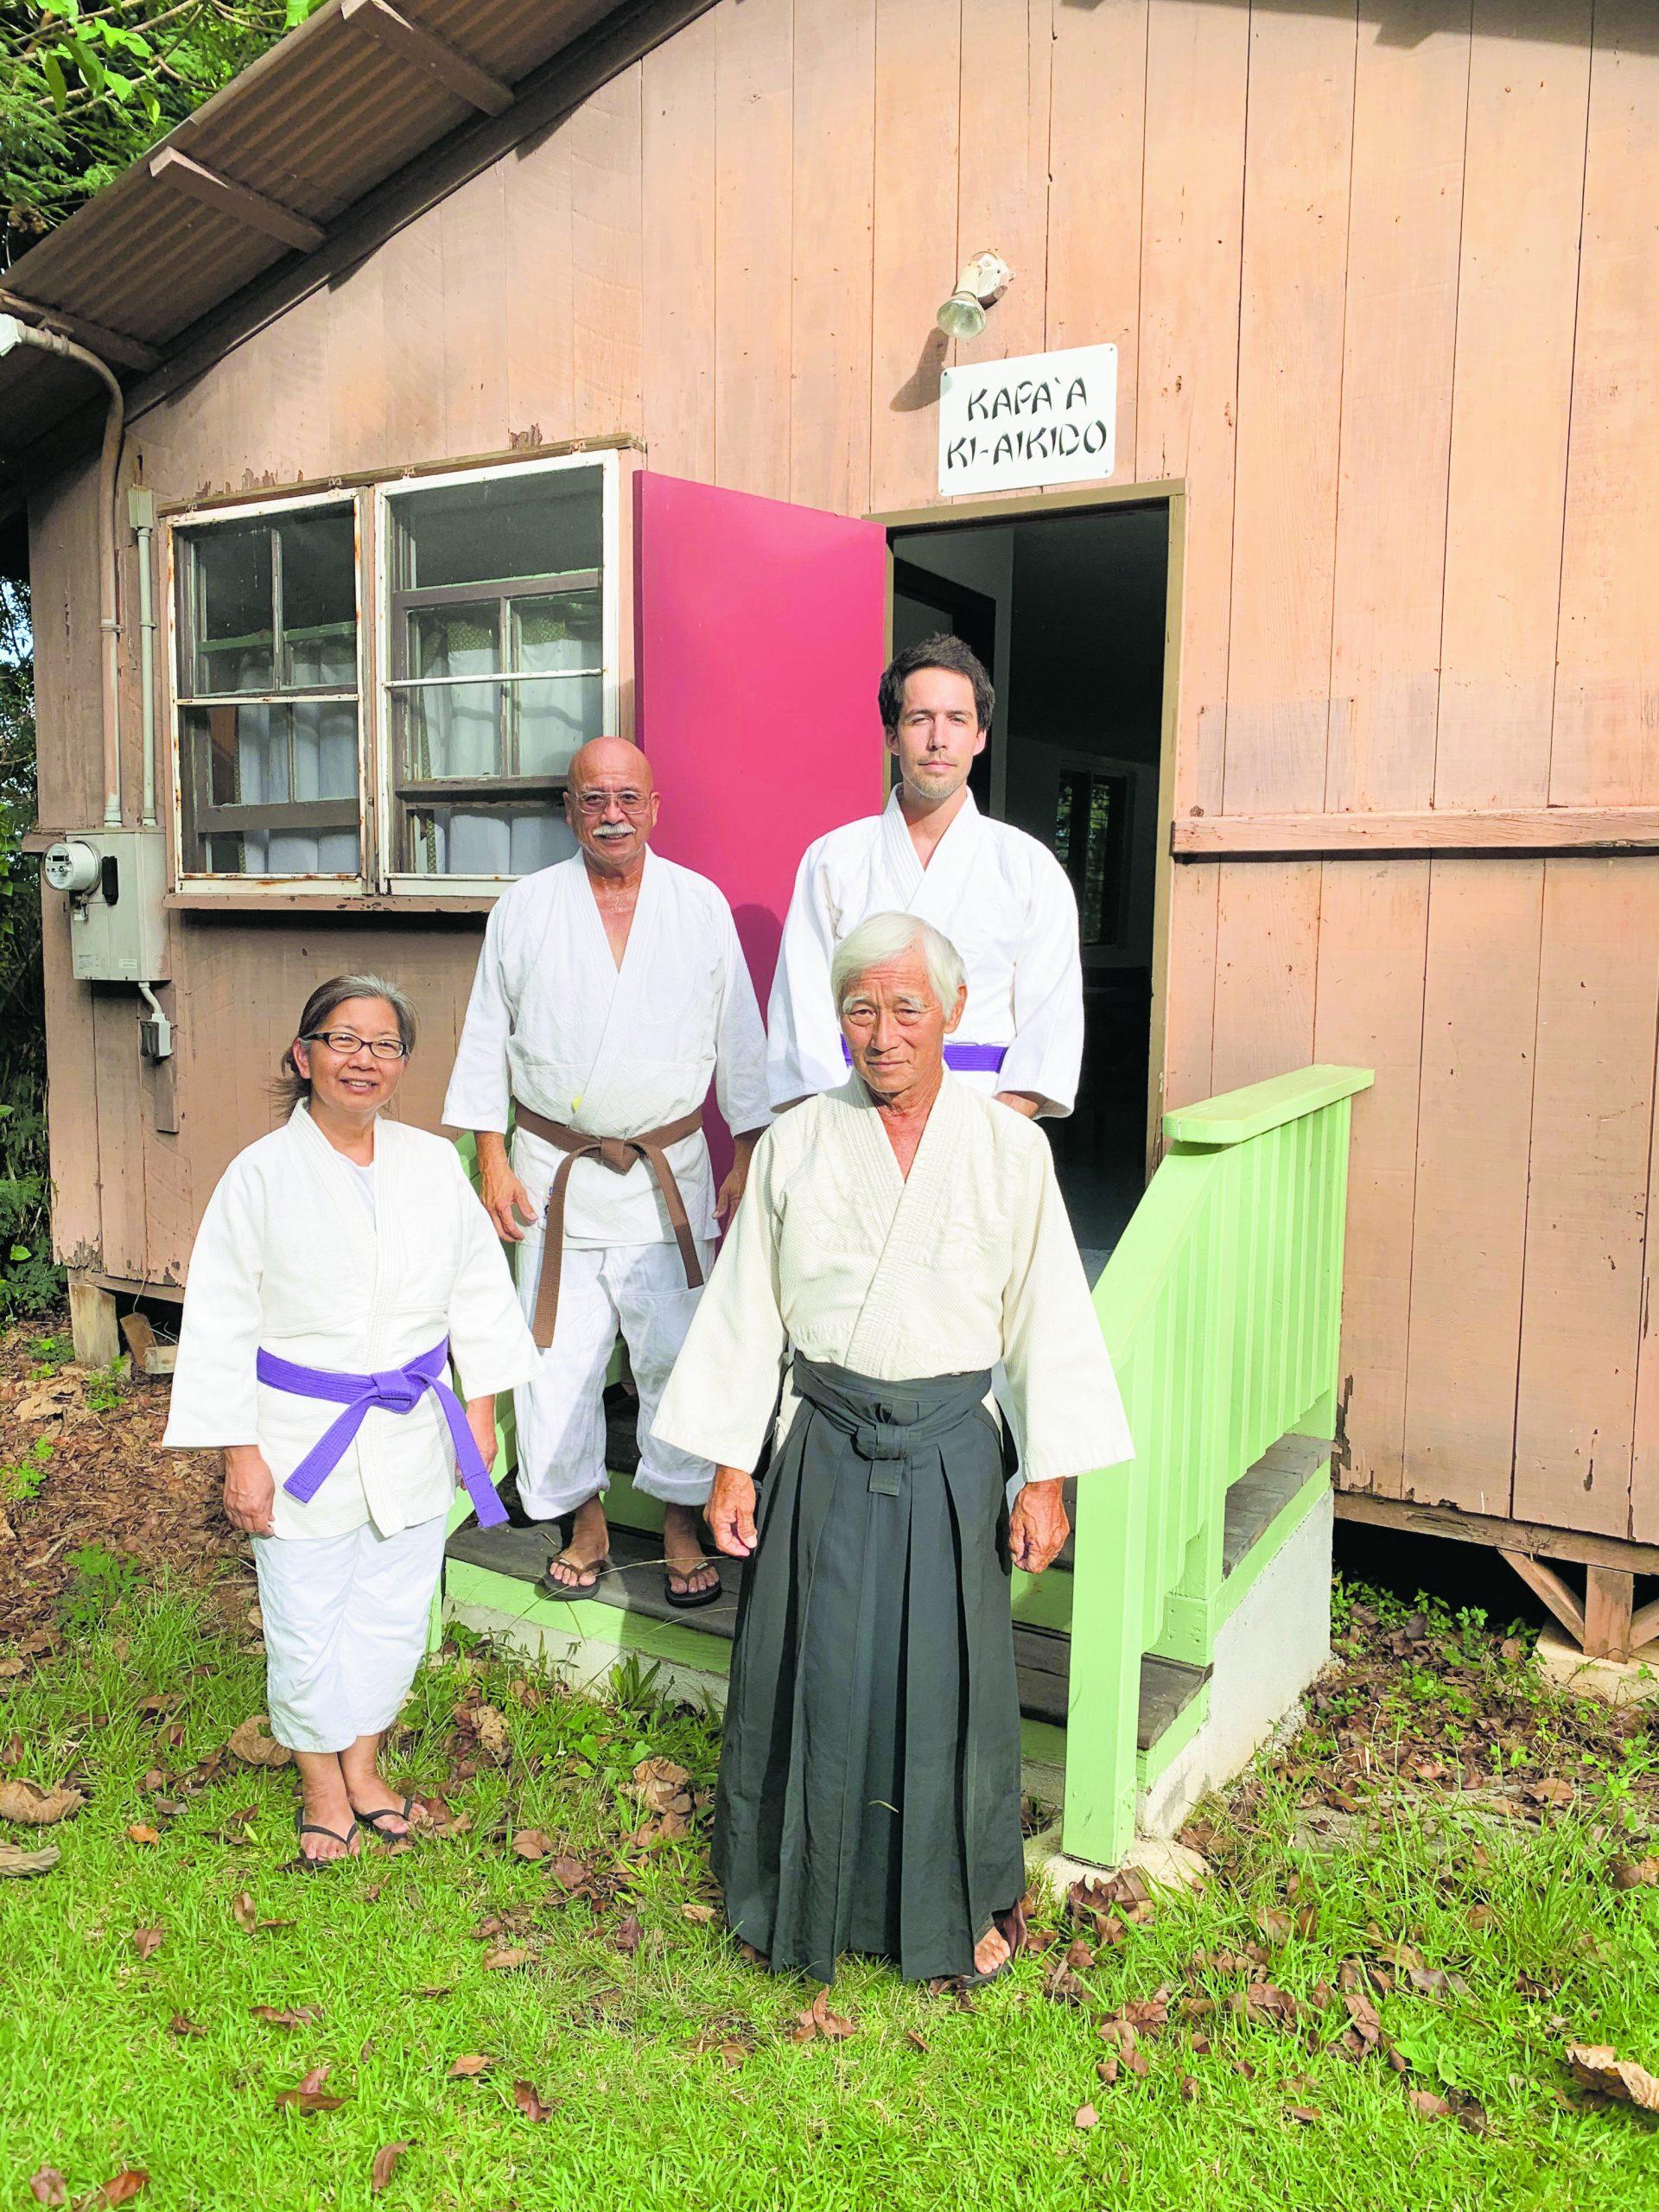 Lloyd Miyashiro-Sensei (wearing black hakama) with his Kapa'a Ki-Aikido students. Standing with him on the ground is Jan Hashizume. Behind them are Gene Hashimura and Brian Gerald.